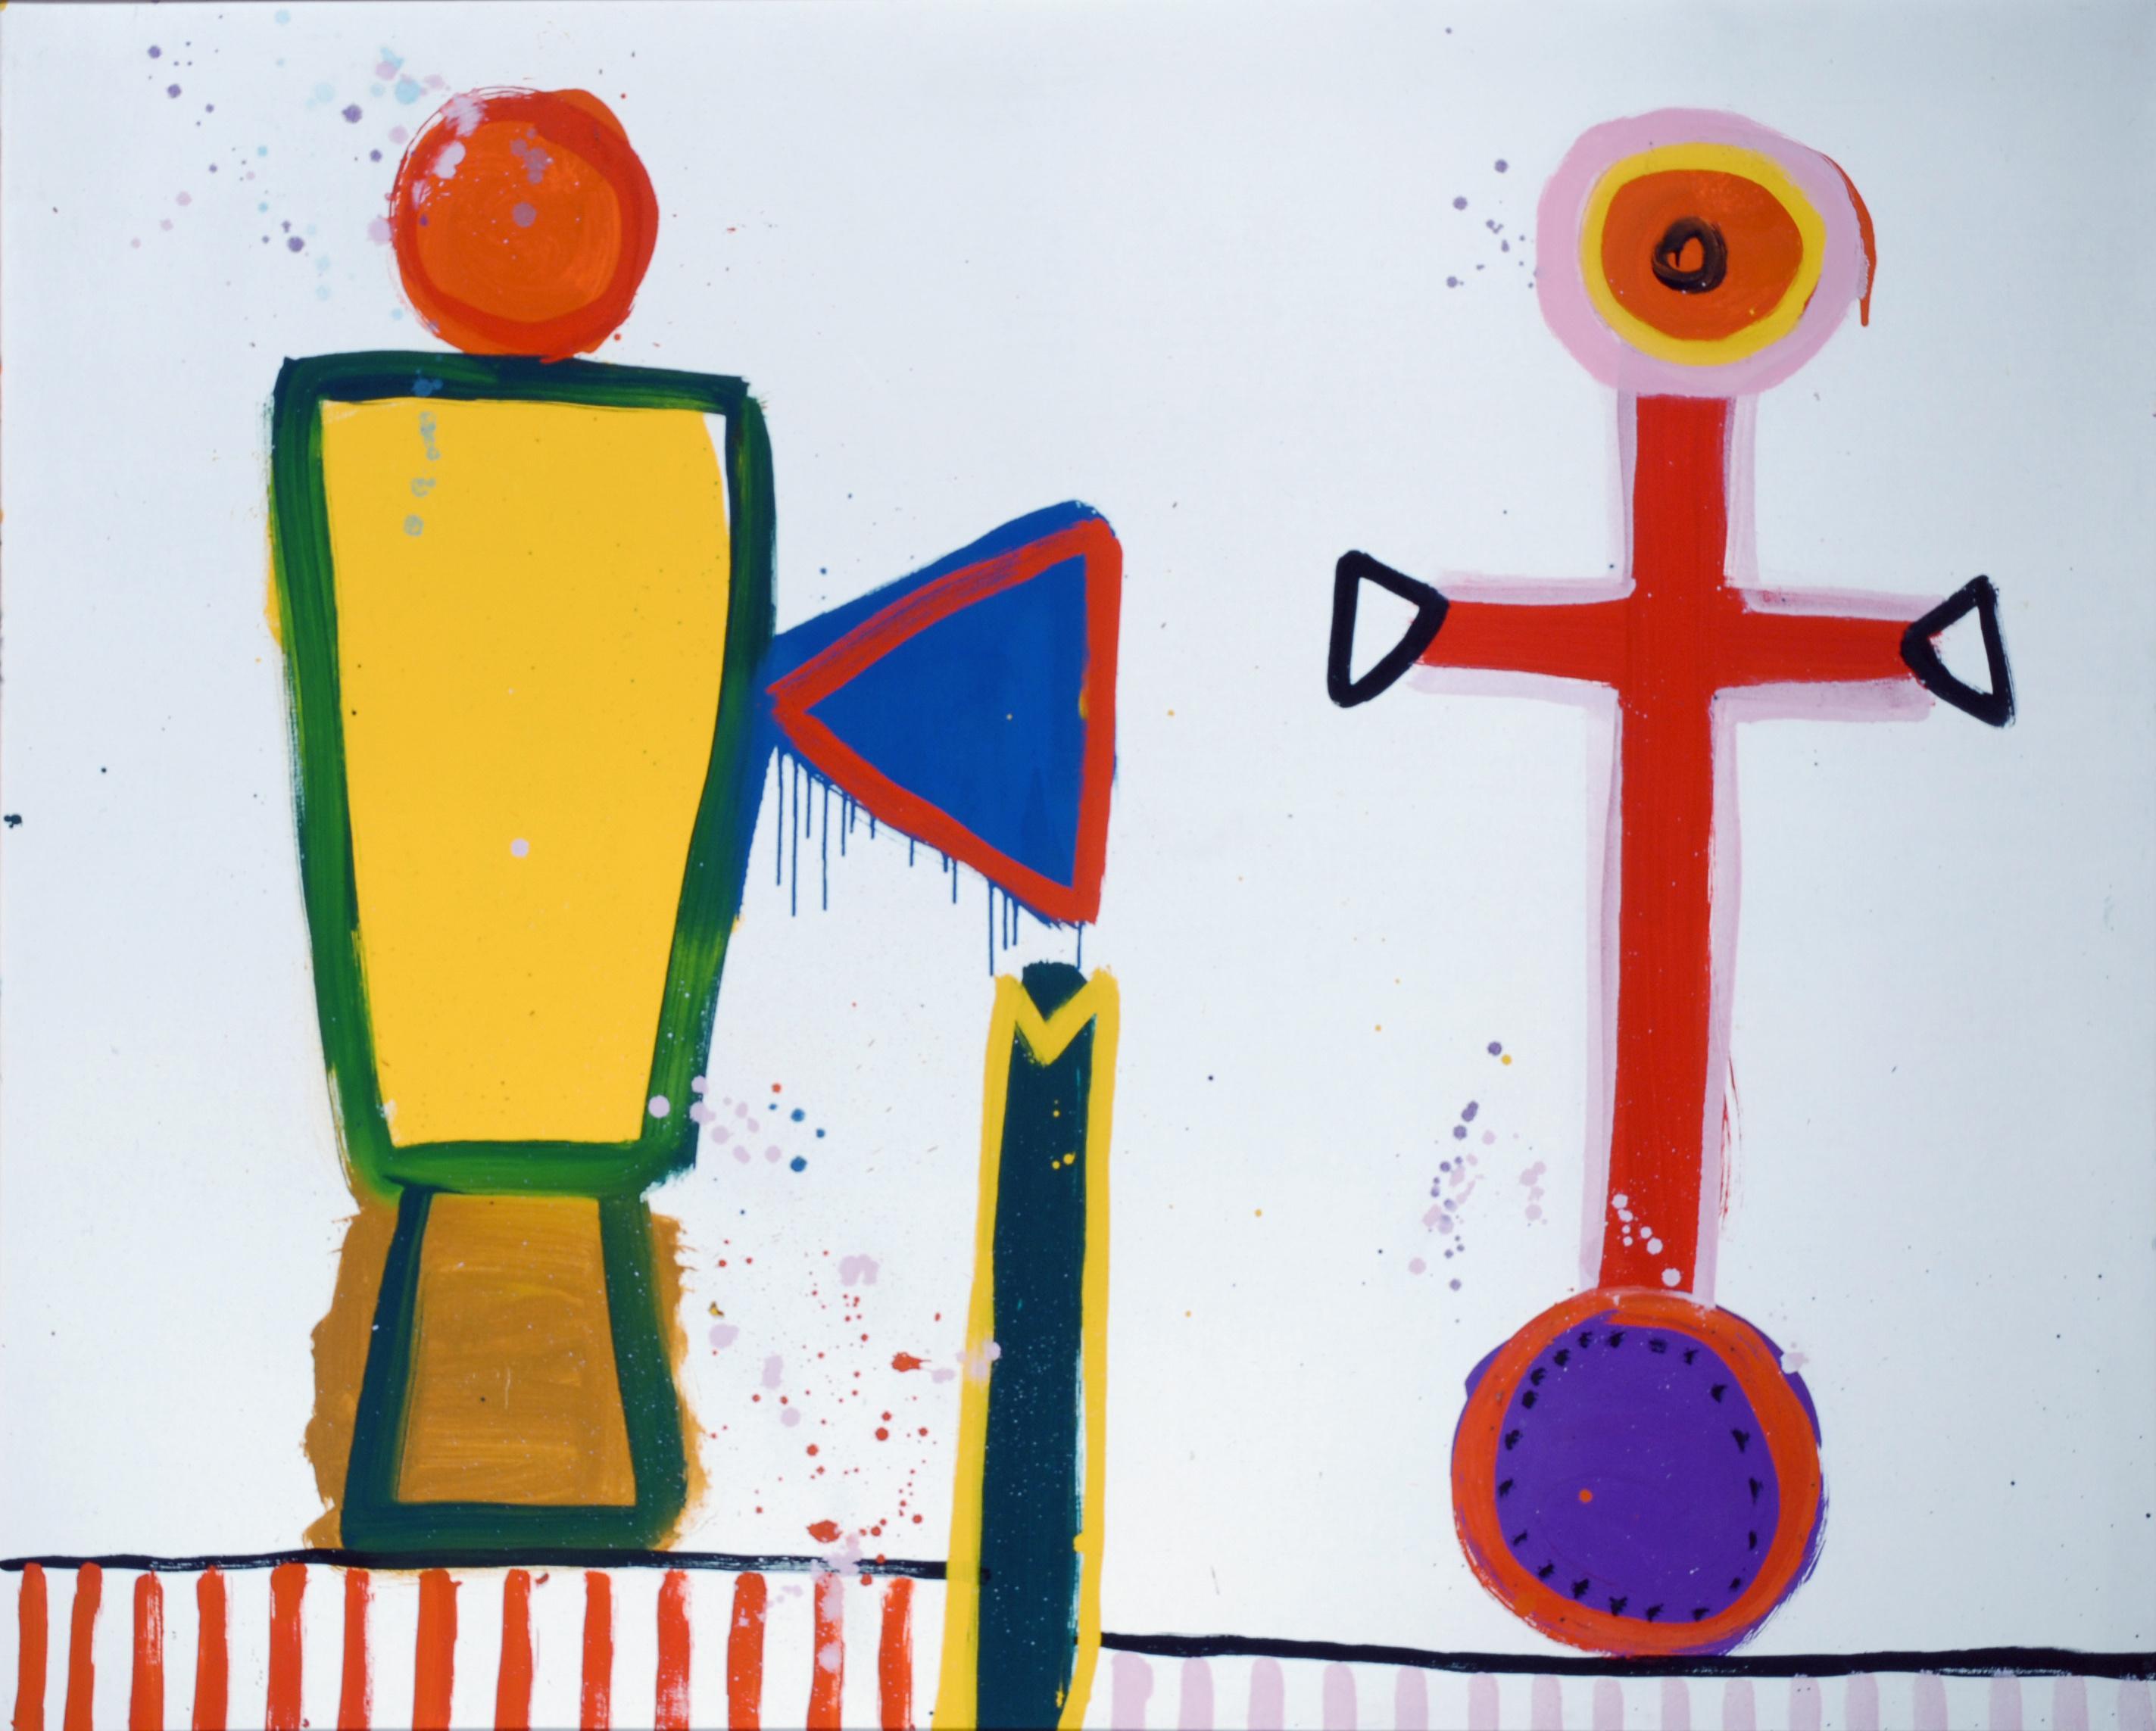 Copulation at its fruitiest – David Hockney, Alan Davie, Christina Quarles review